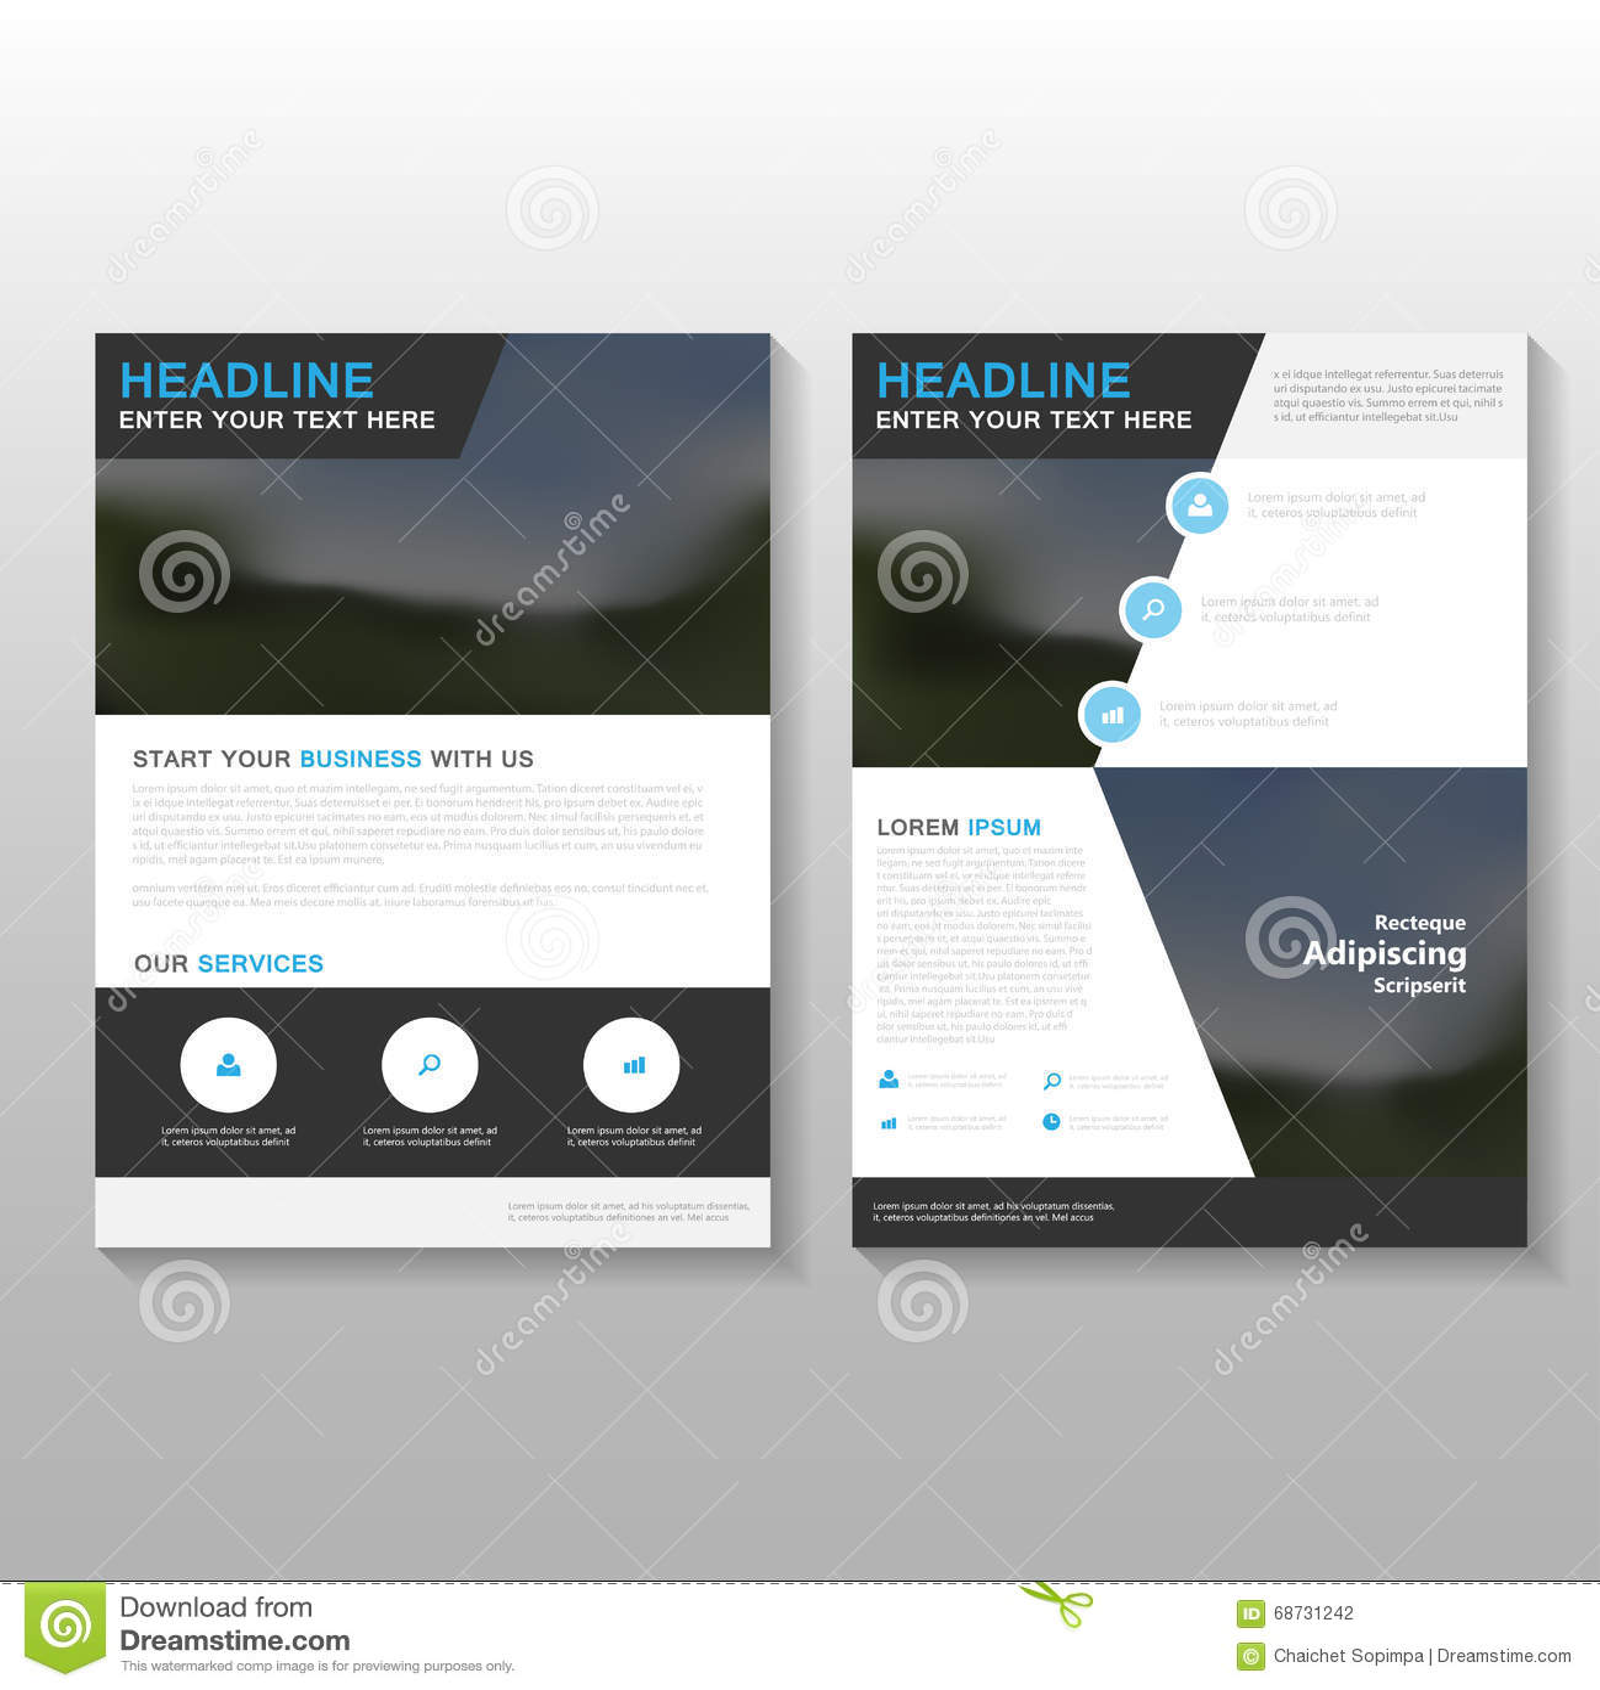 professional business cards template - Etame.mibawa.co